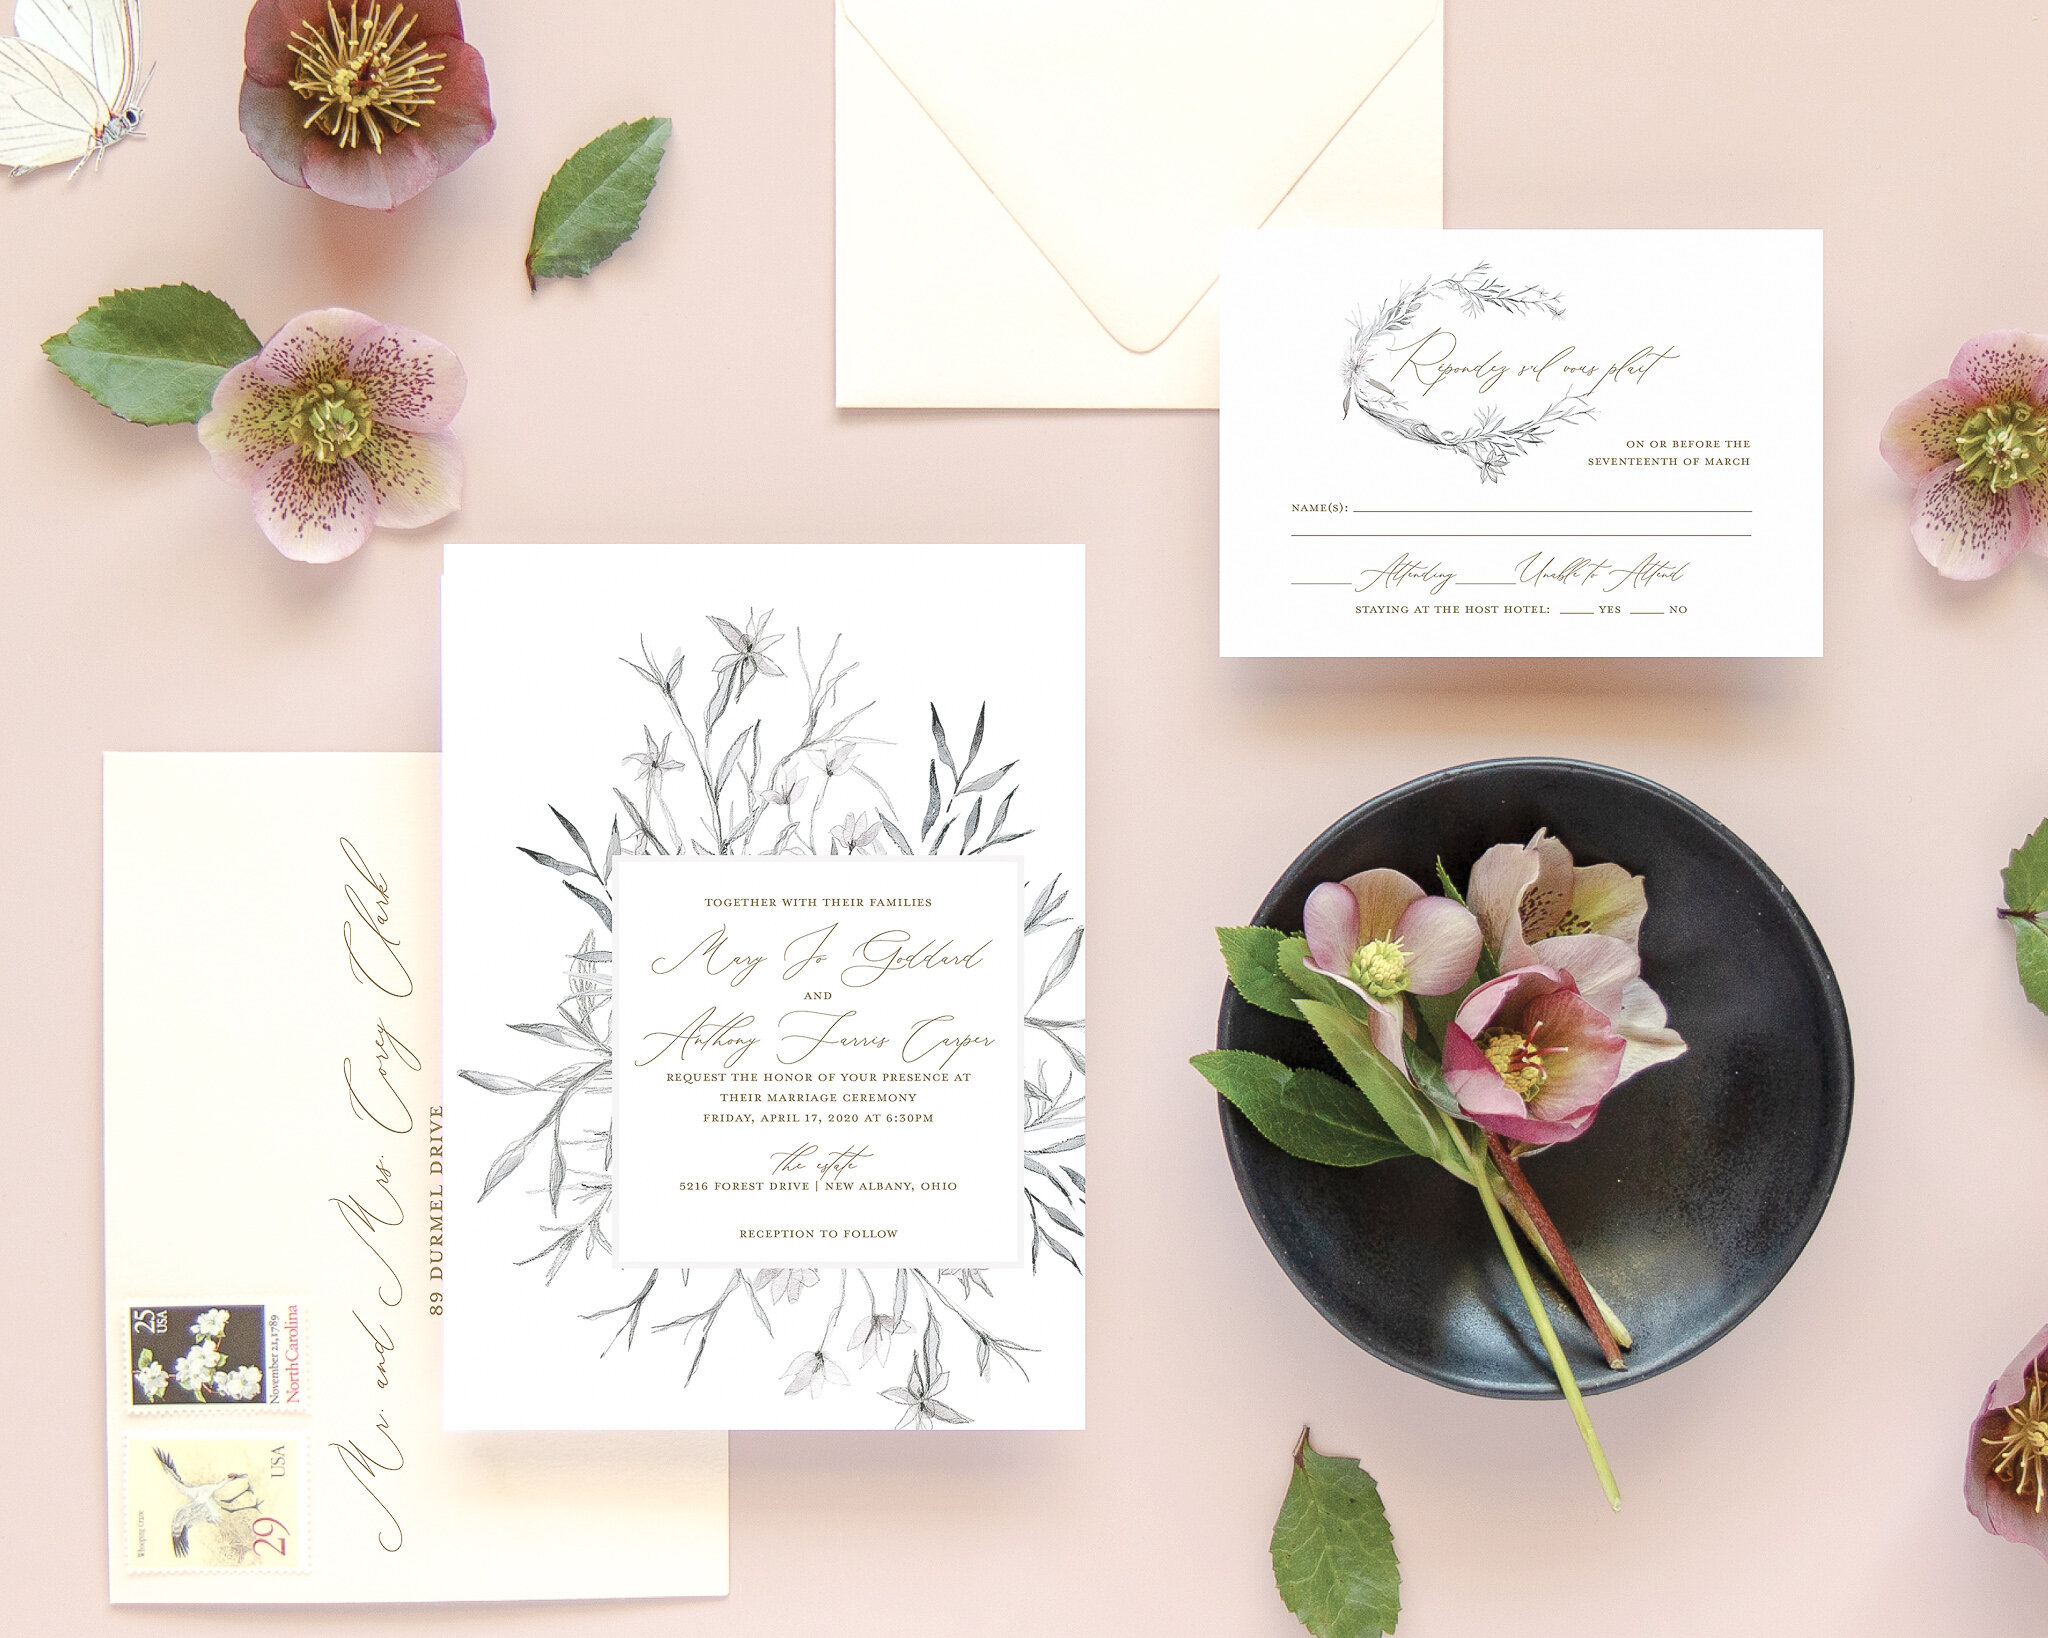 Whimsical Wedding Invitation | The Mary Jo